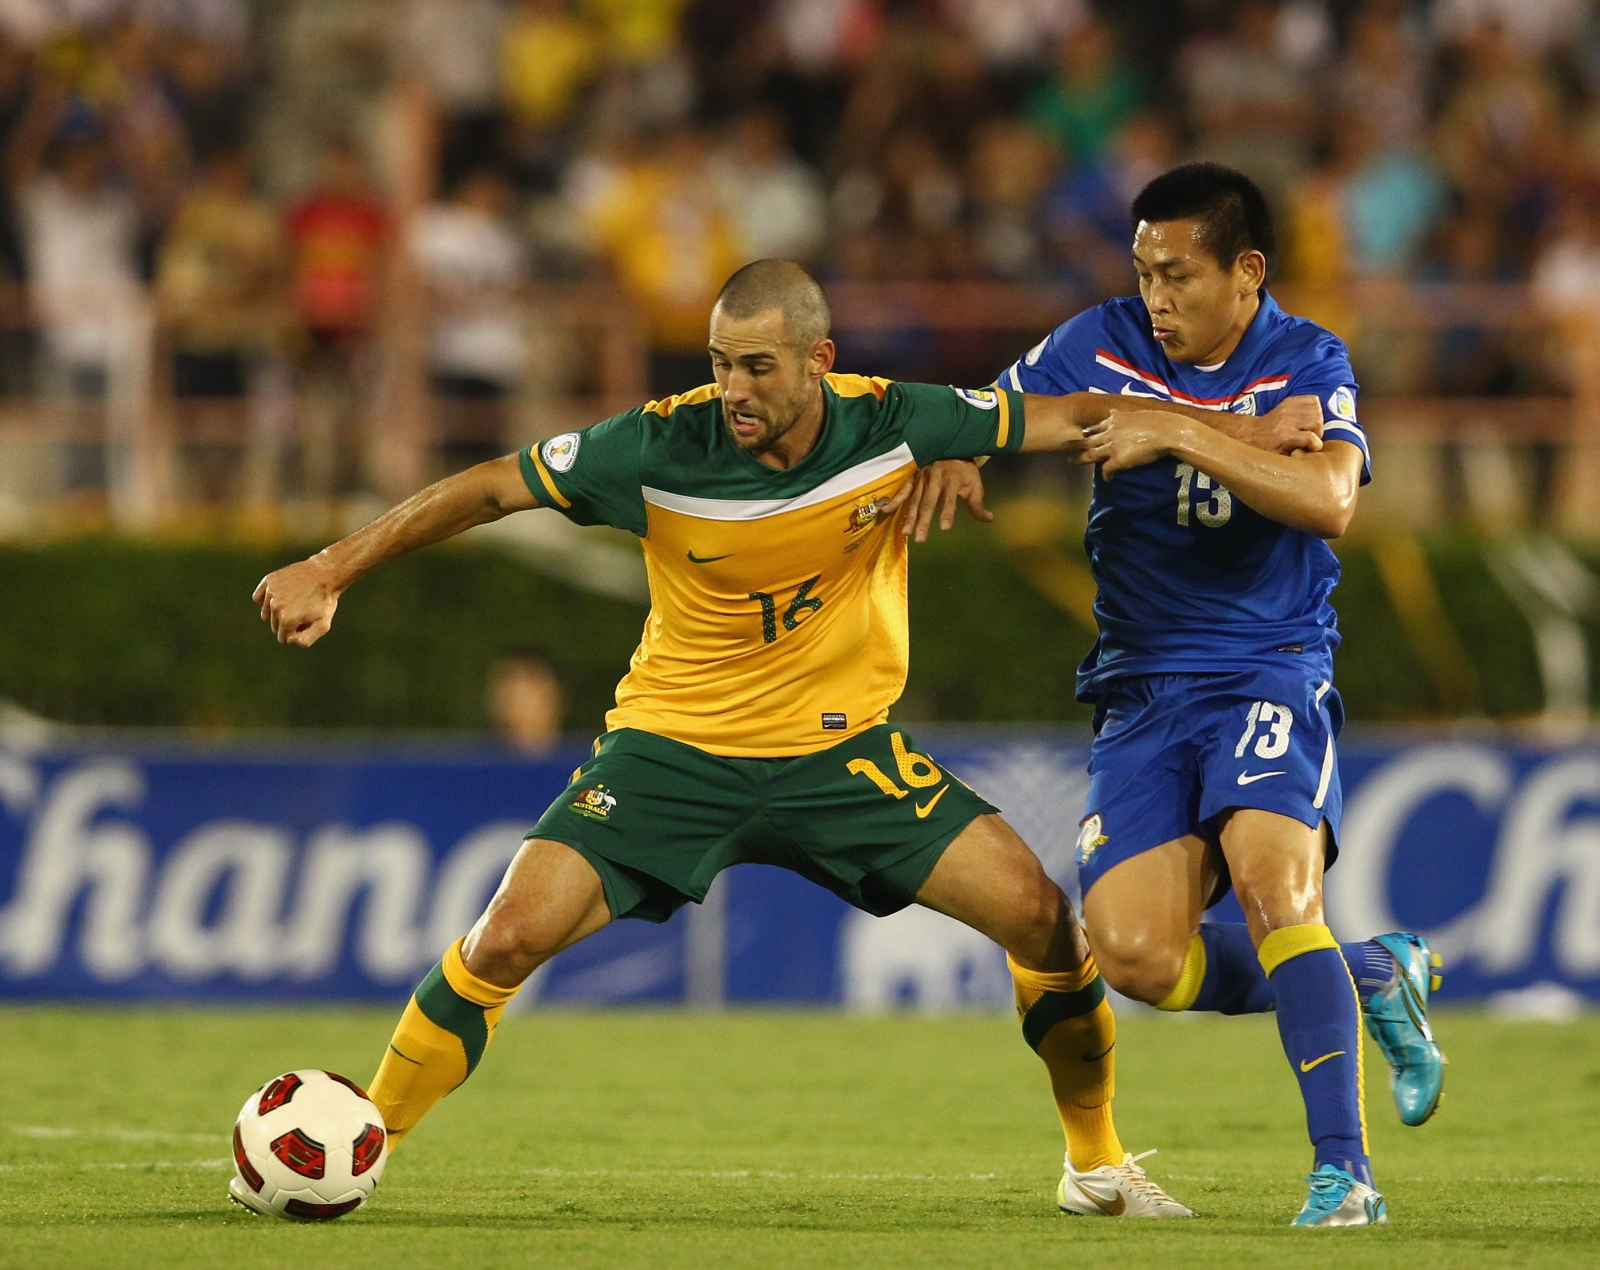 Thailand-Australia football match